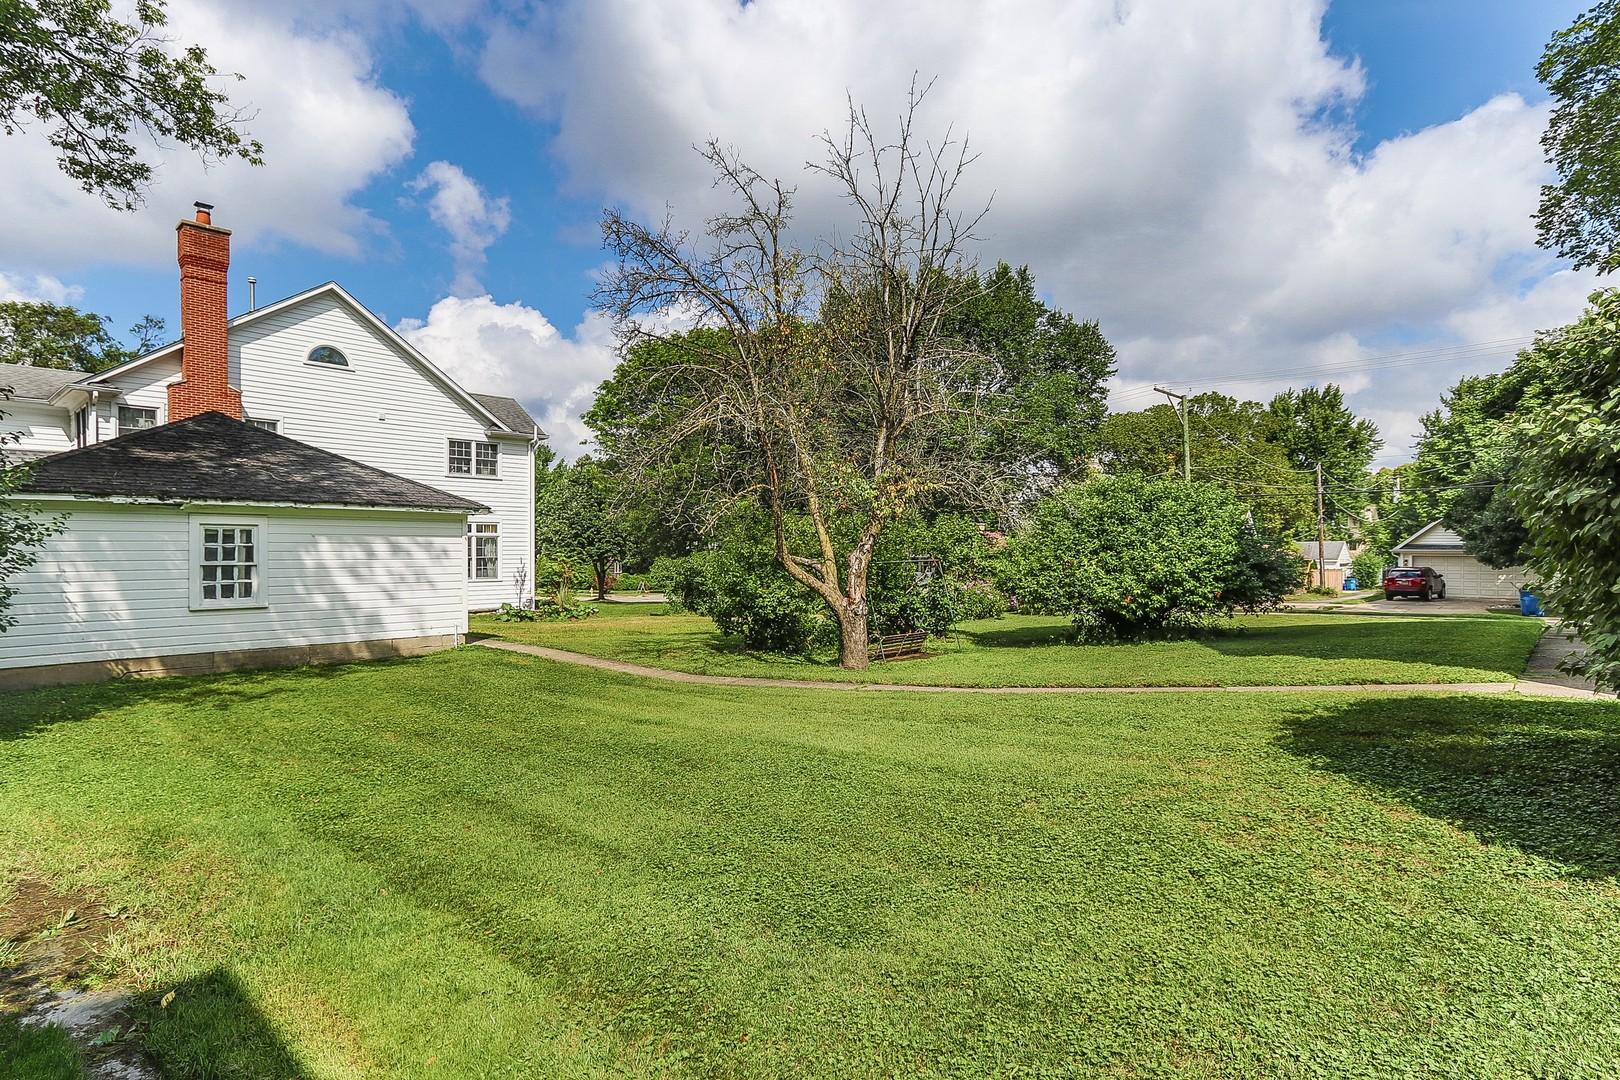 104 South Monroe, Hinsdale, Illinois, 60521